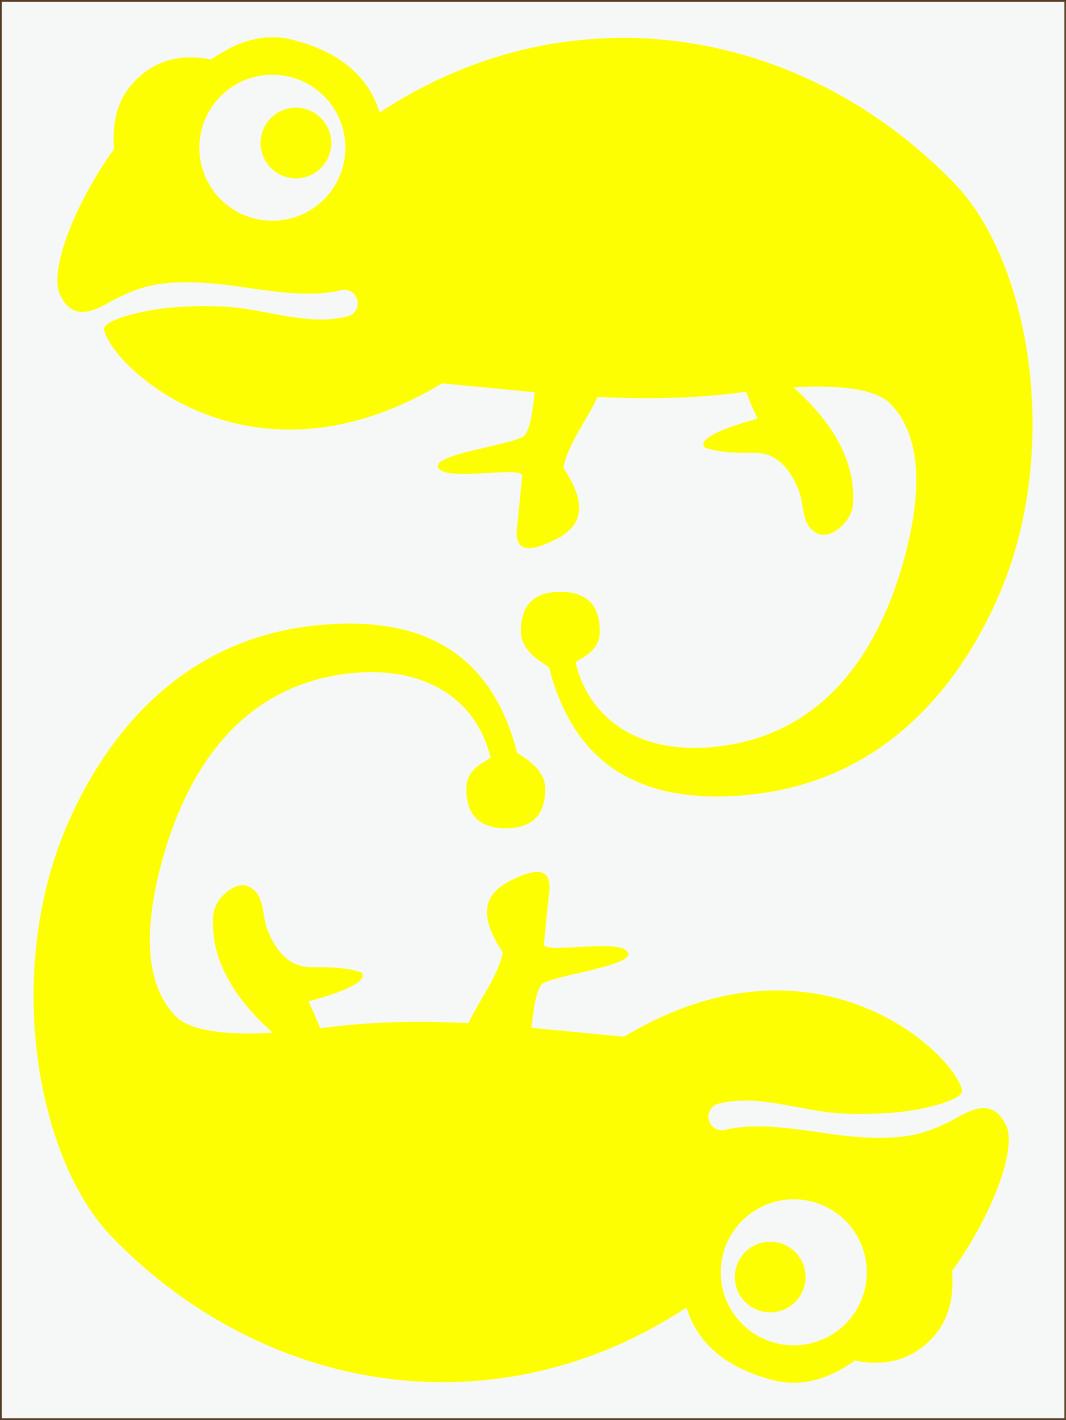 Chameleon neon žltý